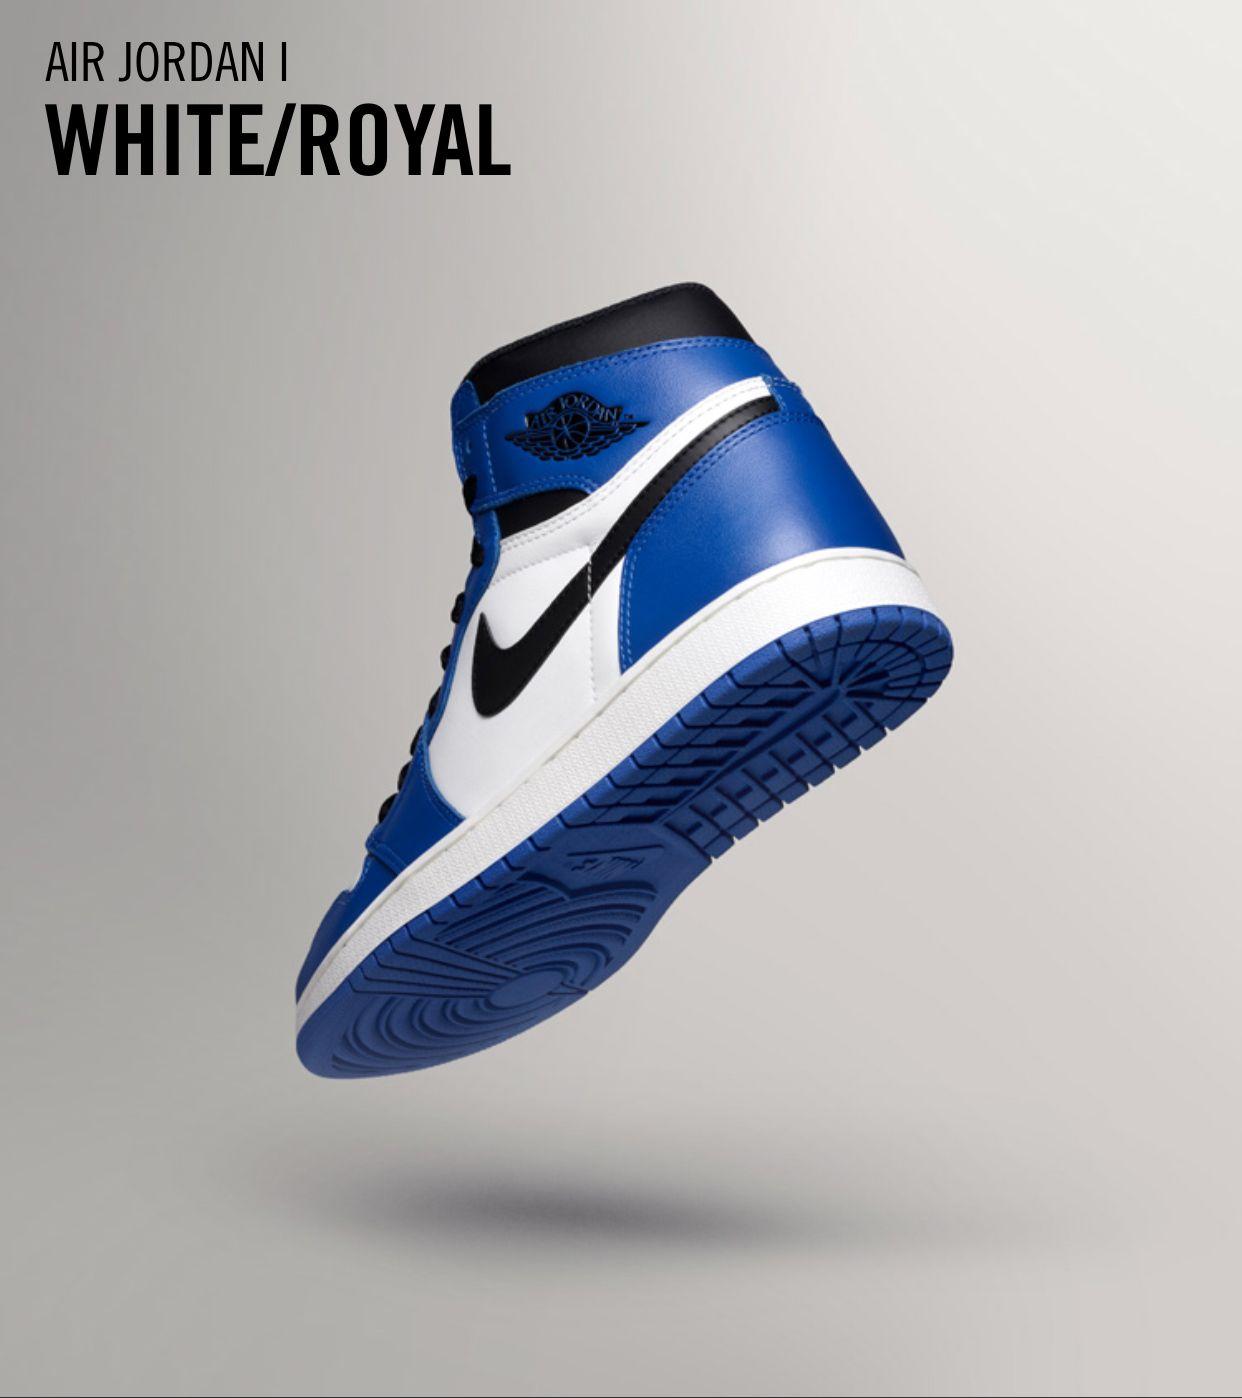 Via Nike Snkrs Https Www Nike Com Us Launch T Air Jordan 1